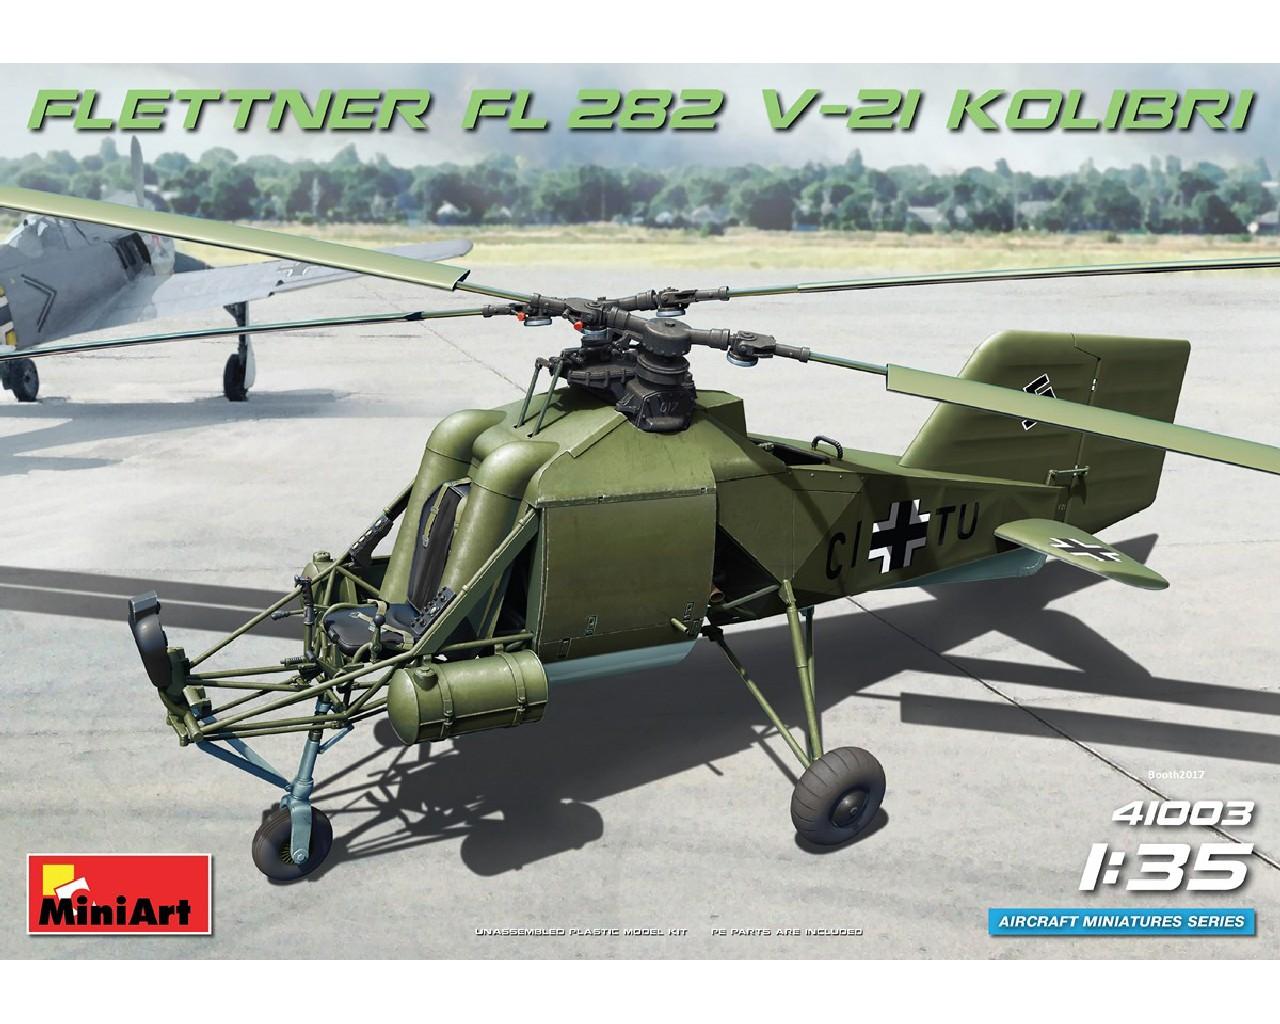 1/35 Flettner Fl 282 V-21 Kolibri